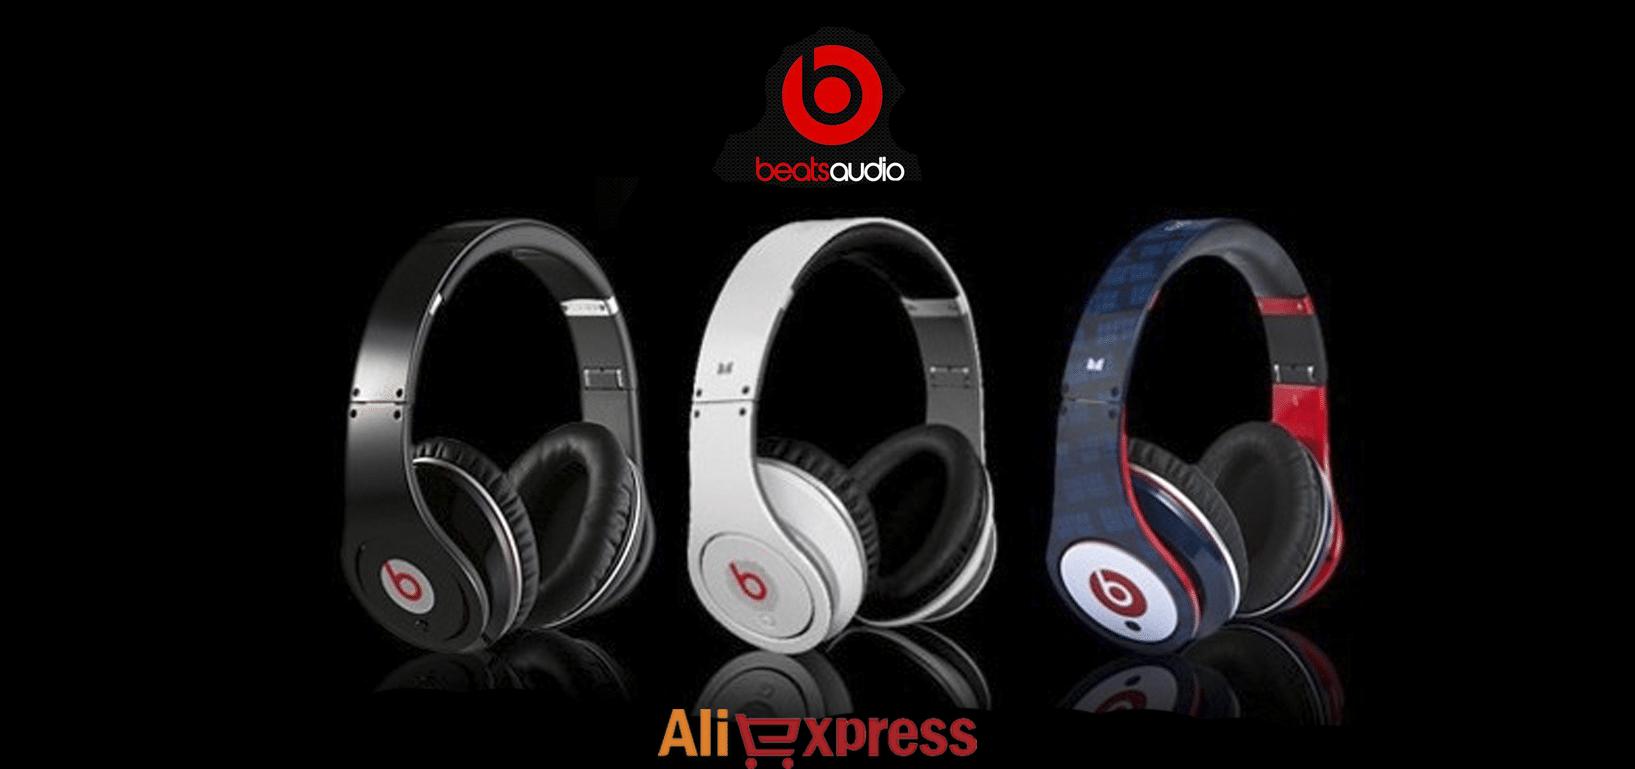 Aliexpress beats